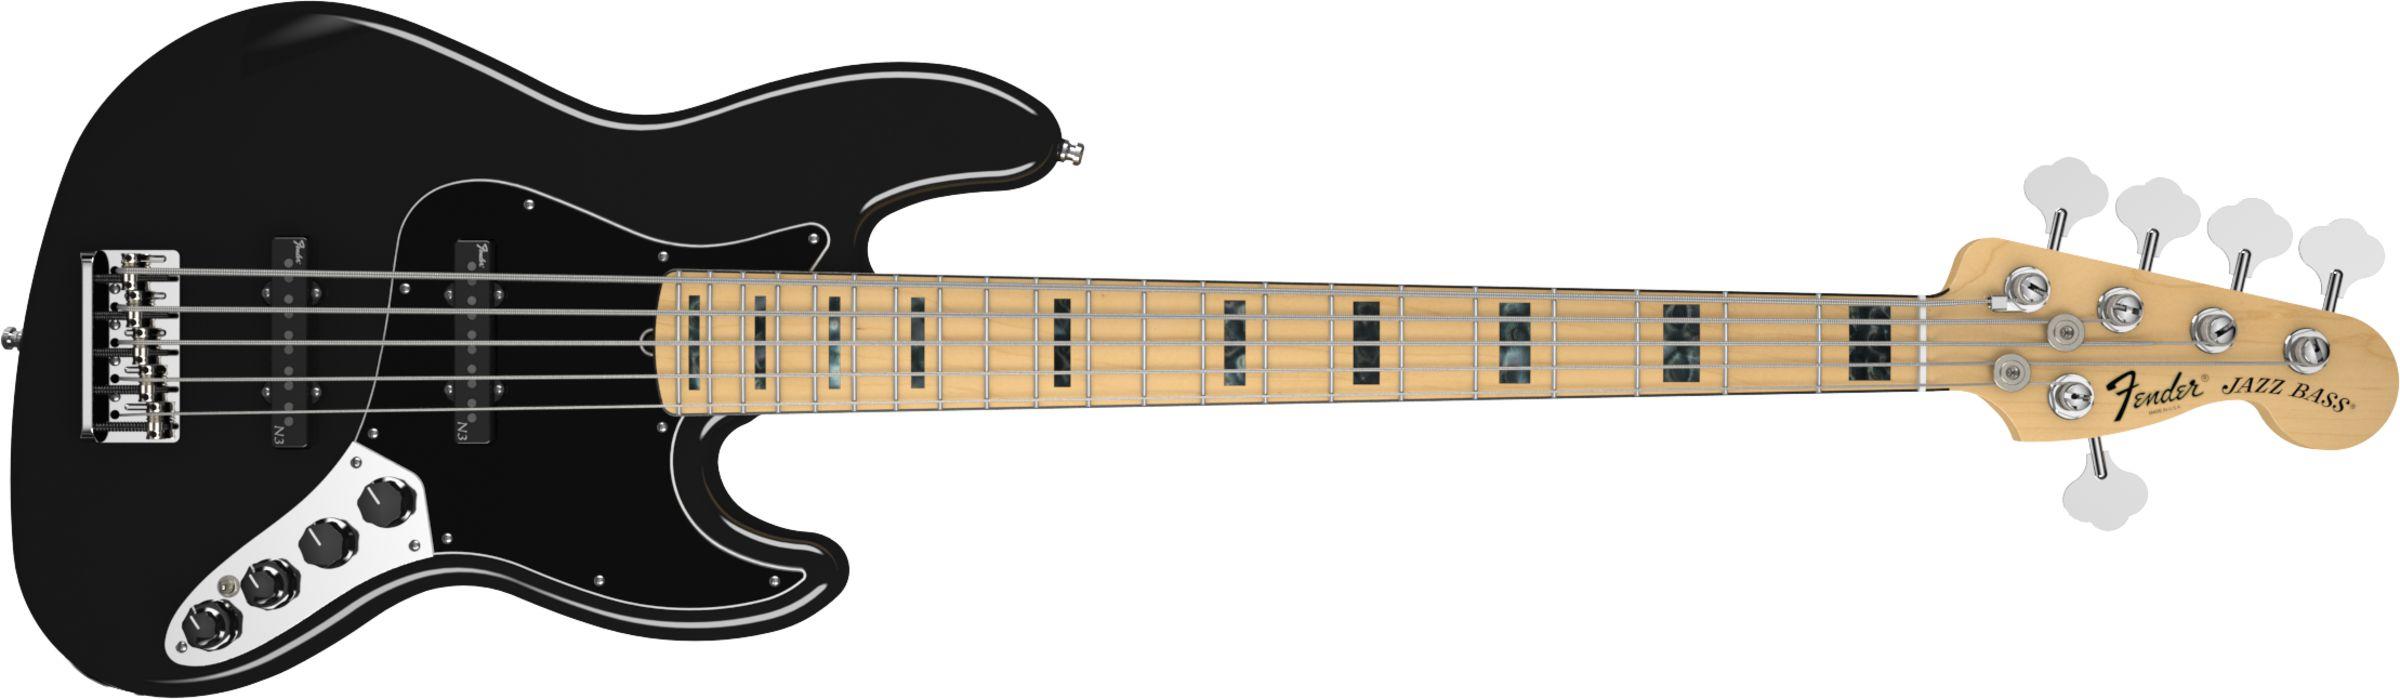 Groß Jazz Bass Schaltplan Gitarren Fotos - Elektrische Schaltplan ...